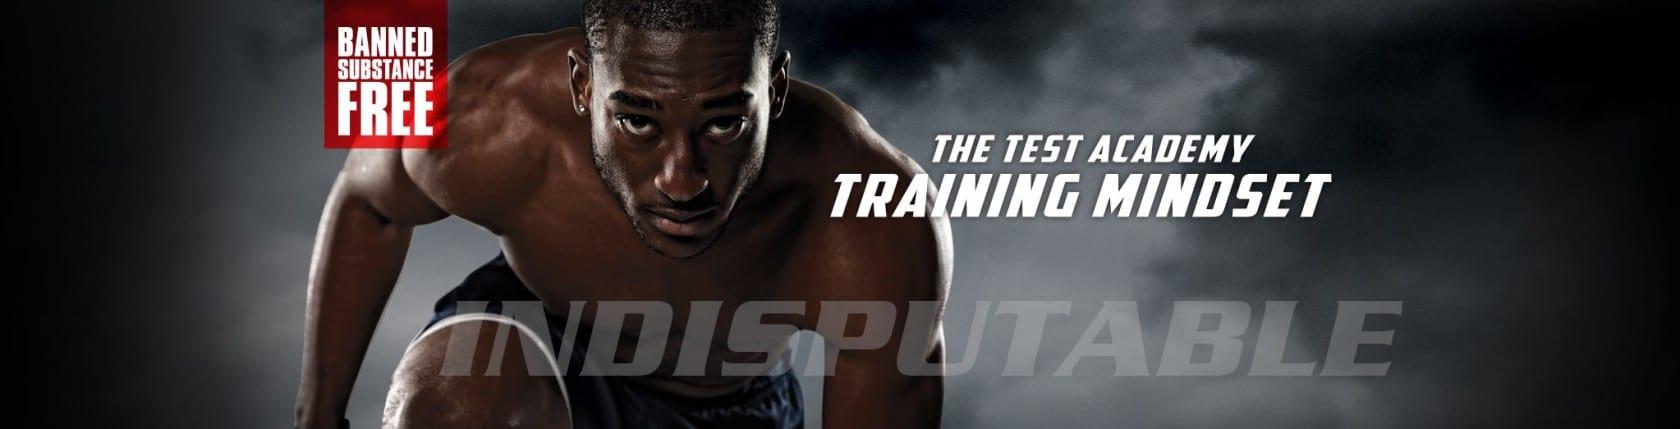 Free body building training